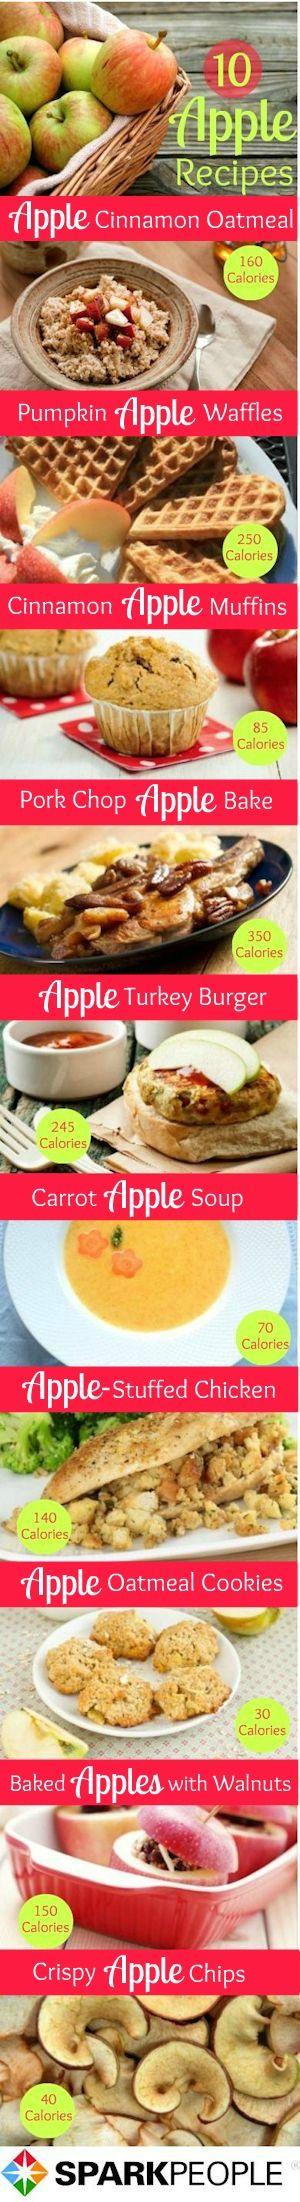 Apple recipes via Sparkpeople